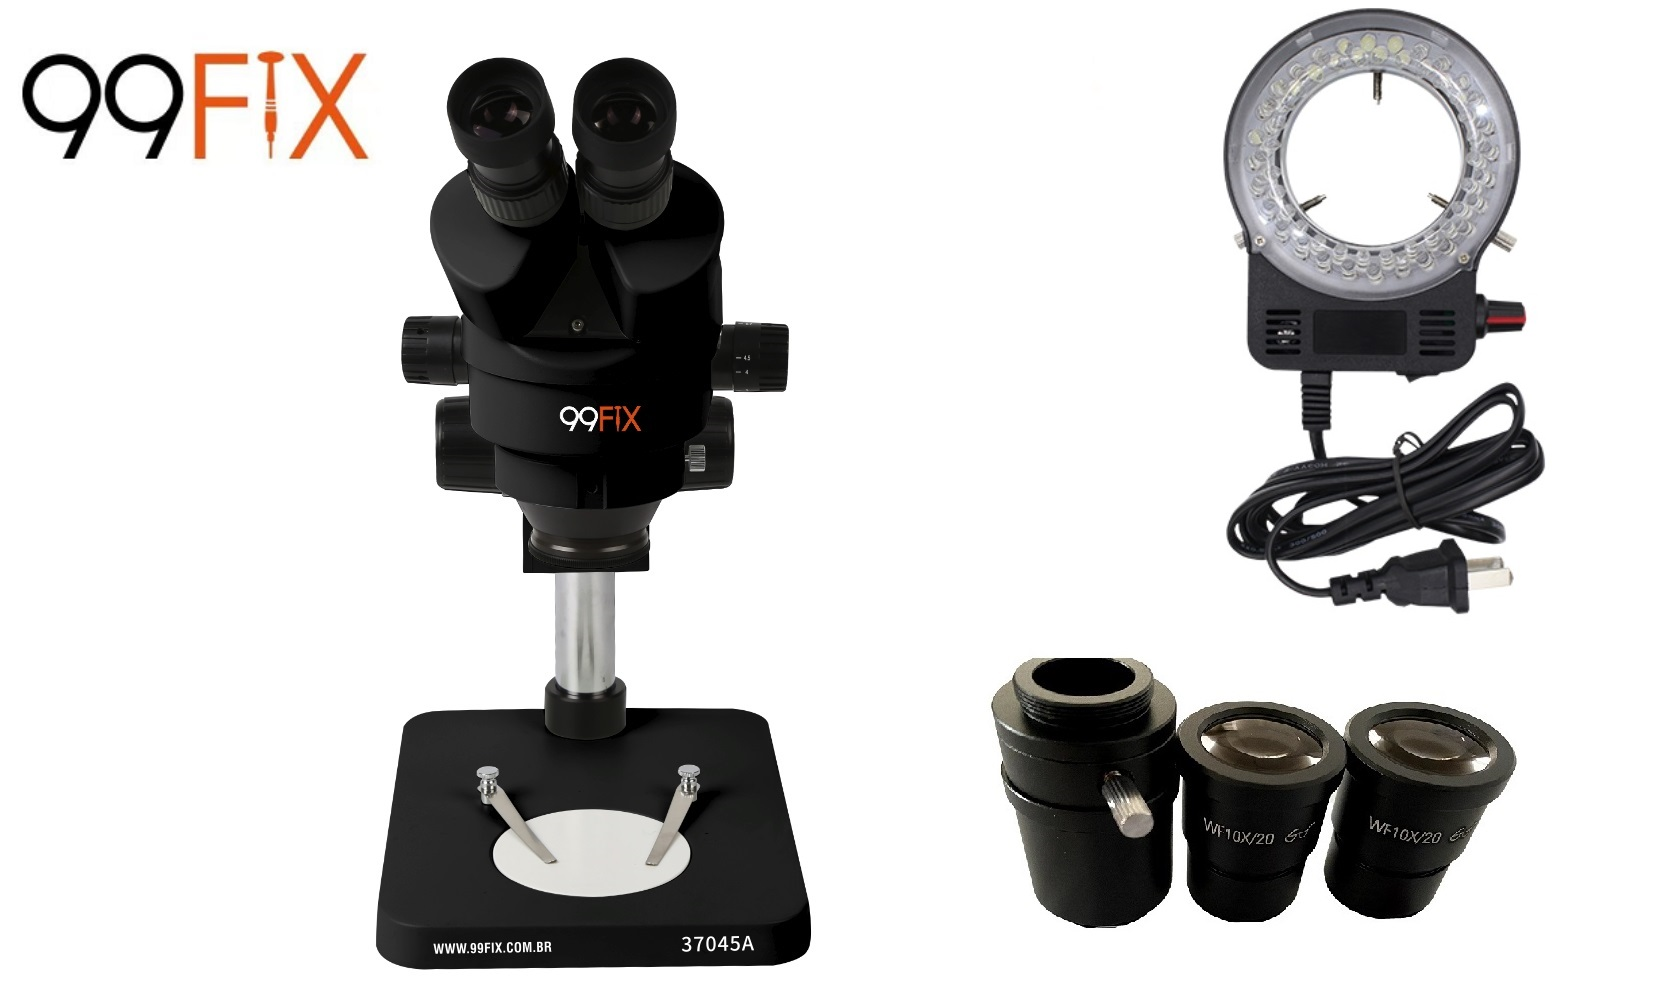 99FIX 37045A MICROSCÓPIO ESTEREOSCÓPICO TRINOCULAR Preto Simul-focal  + Lâmpada de LED Preta +NF